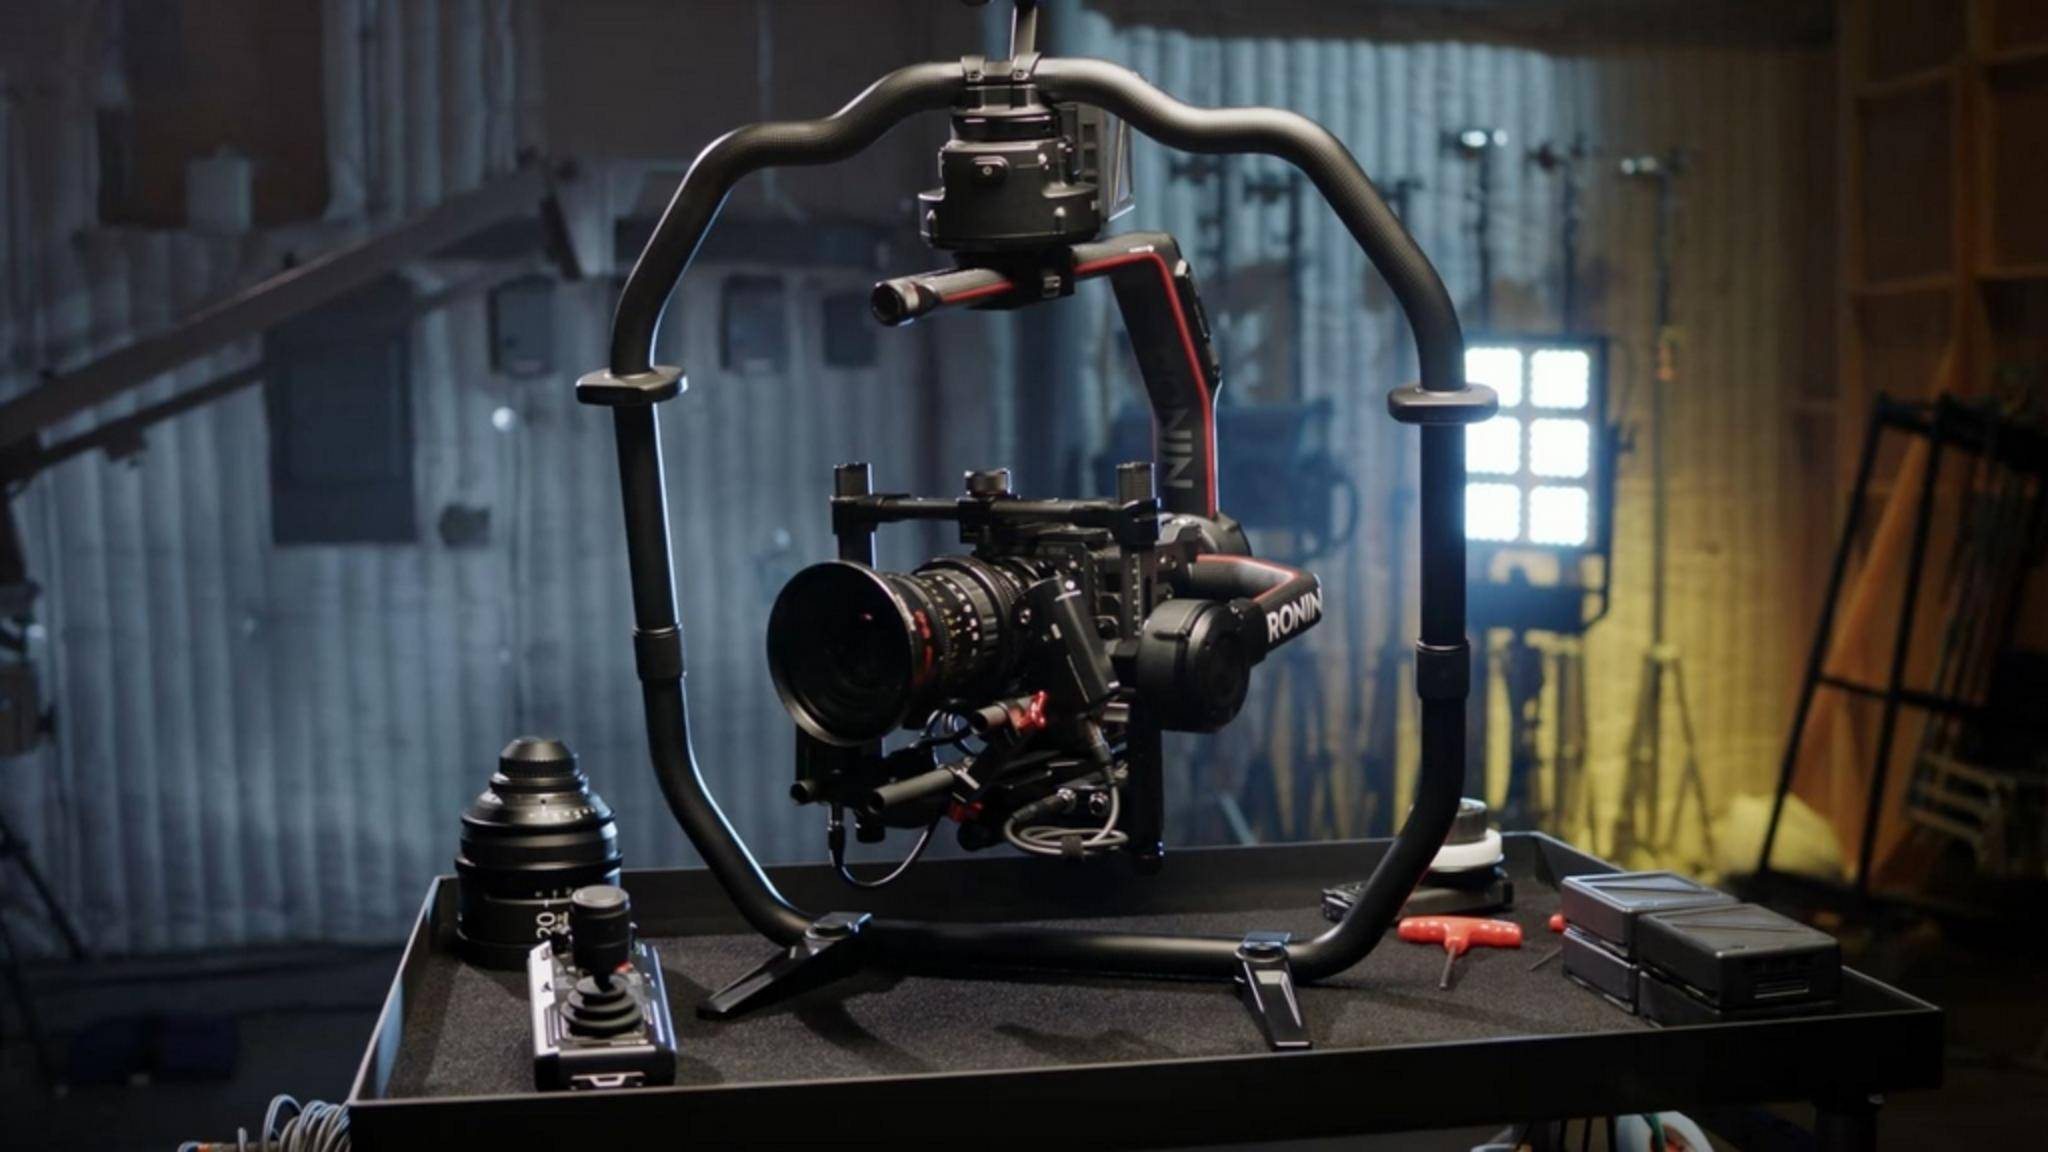 Mit dem DJI Ronin 2 erhalten Filmemacher einen neuen Profi-Gimbal.